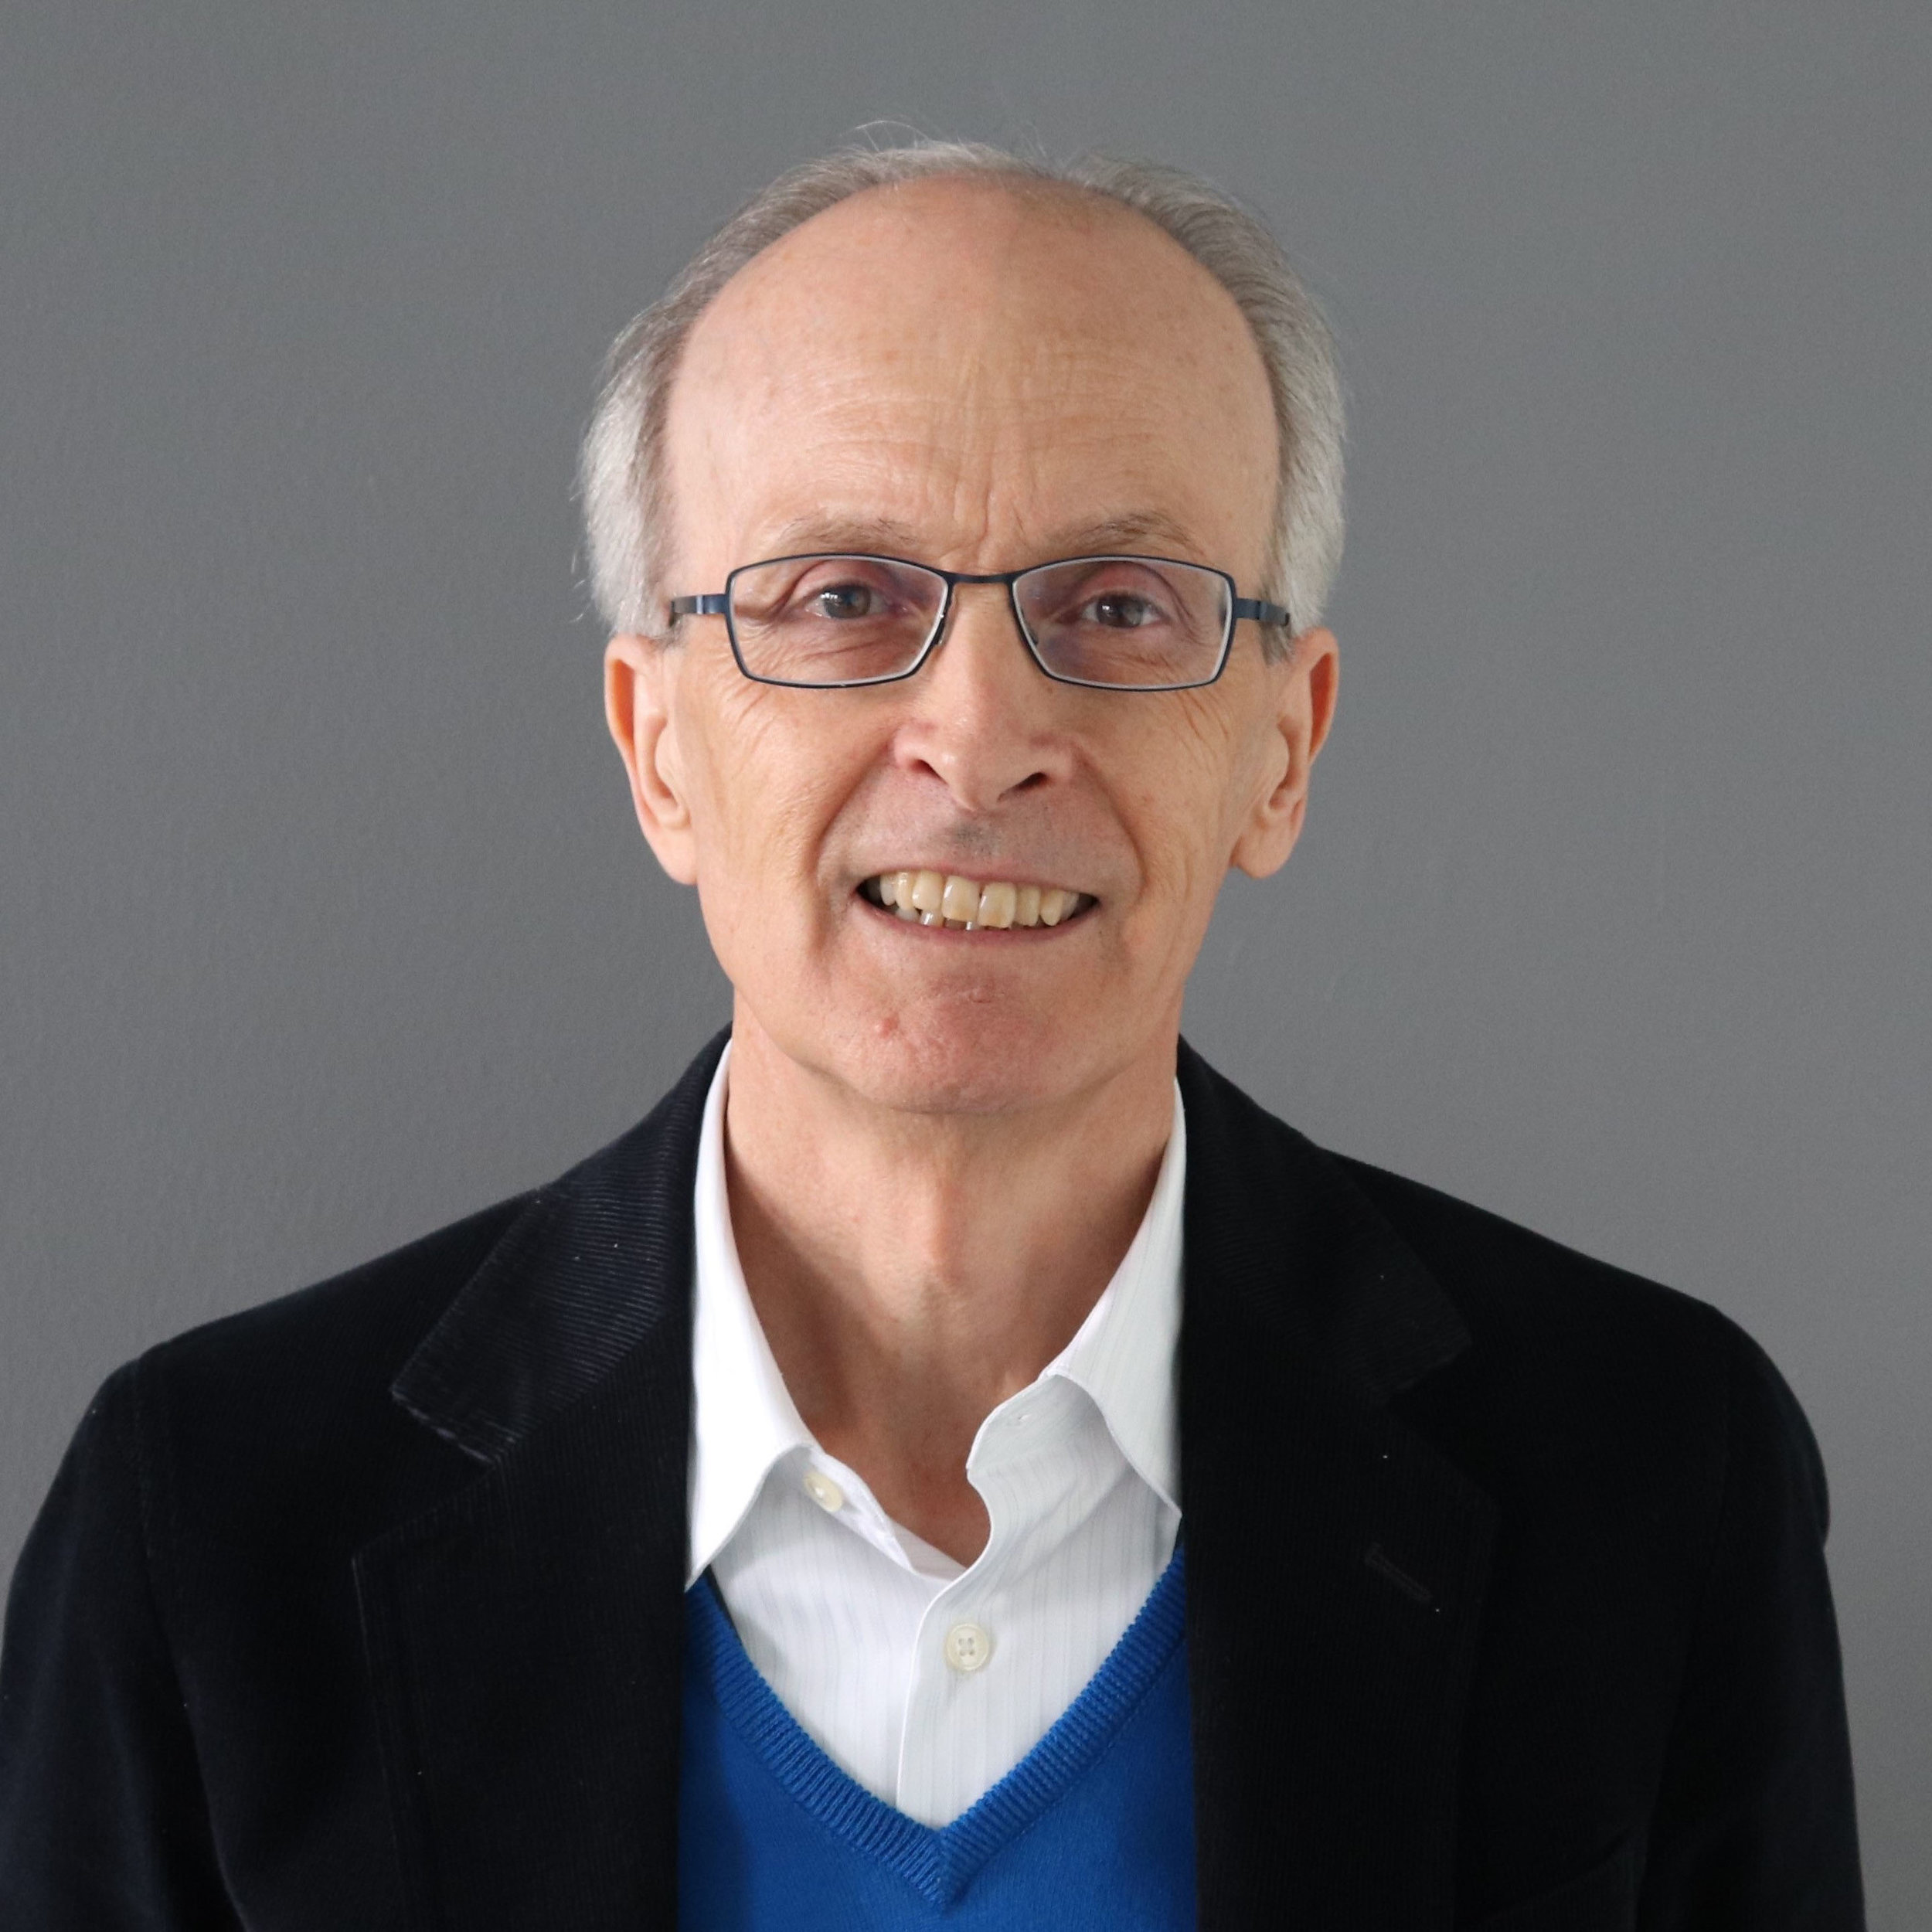 Professor Alan C Walker CBE - Professor of Social Policy and Social Gerontology at the University of Sheffield, UKRead Biography